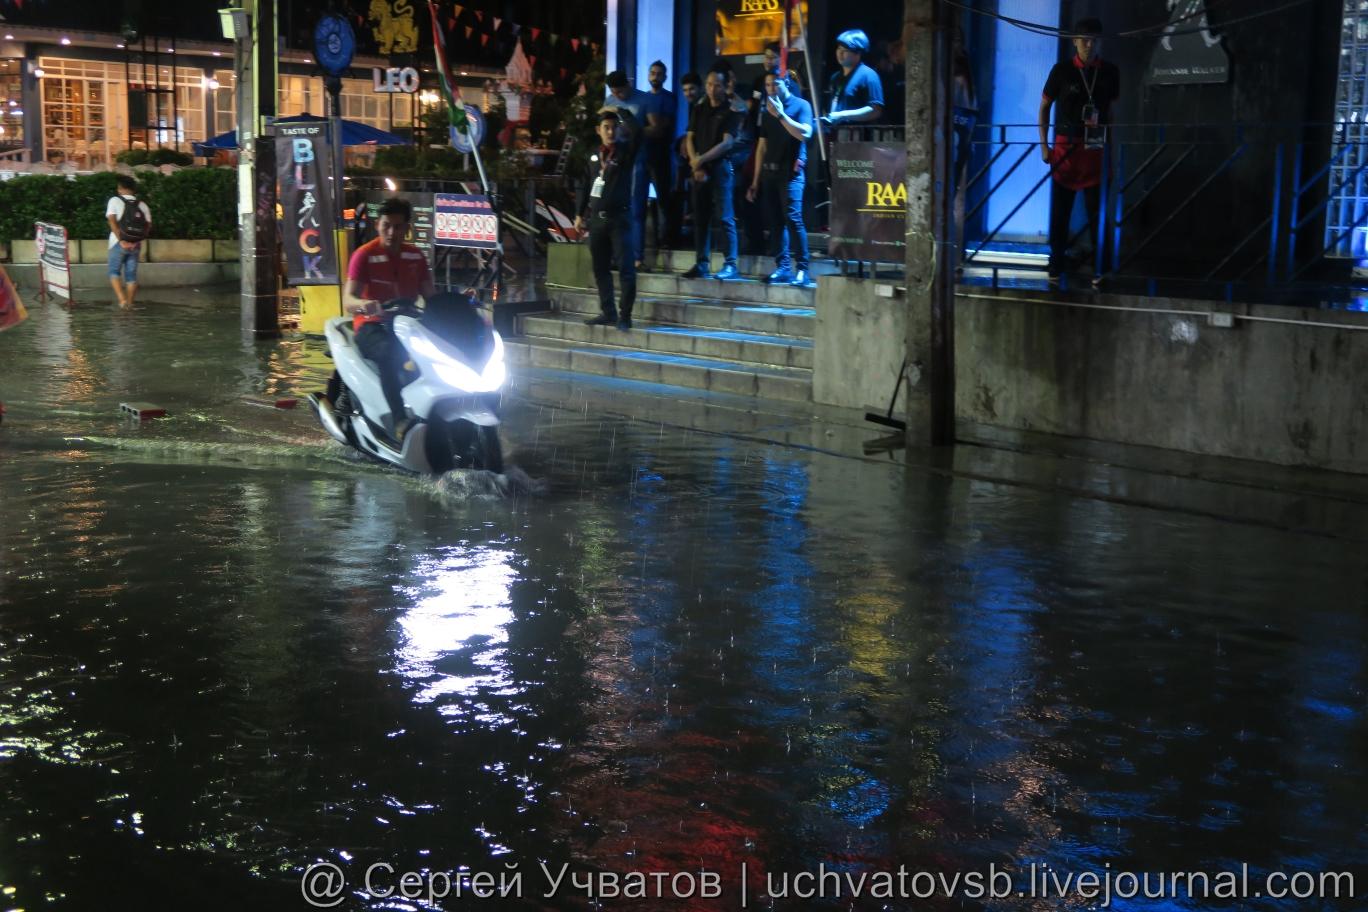 Walking Street в Таиланде (Паттайя) смыло дождем 5